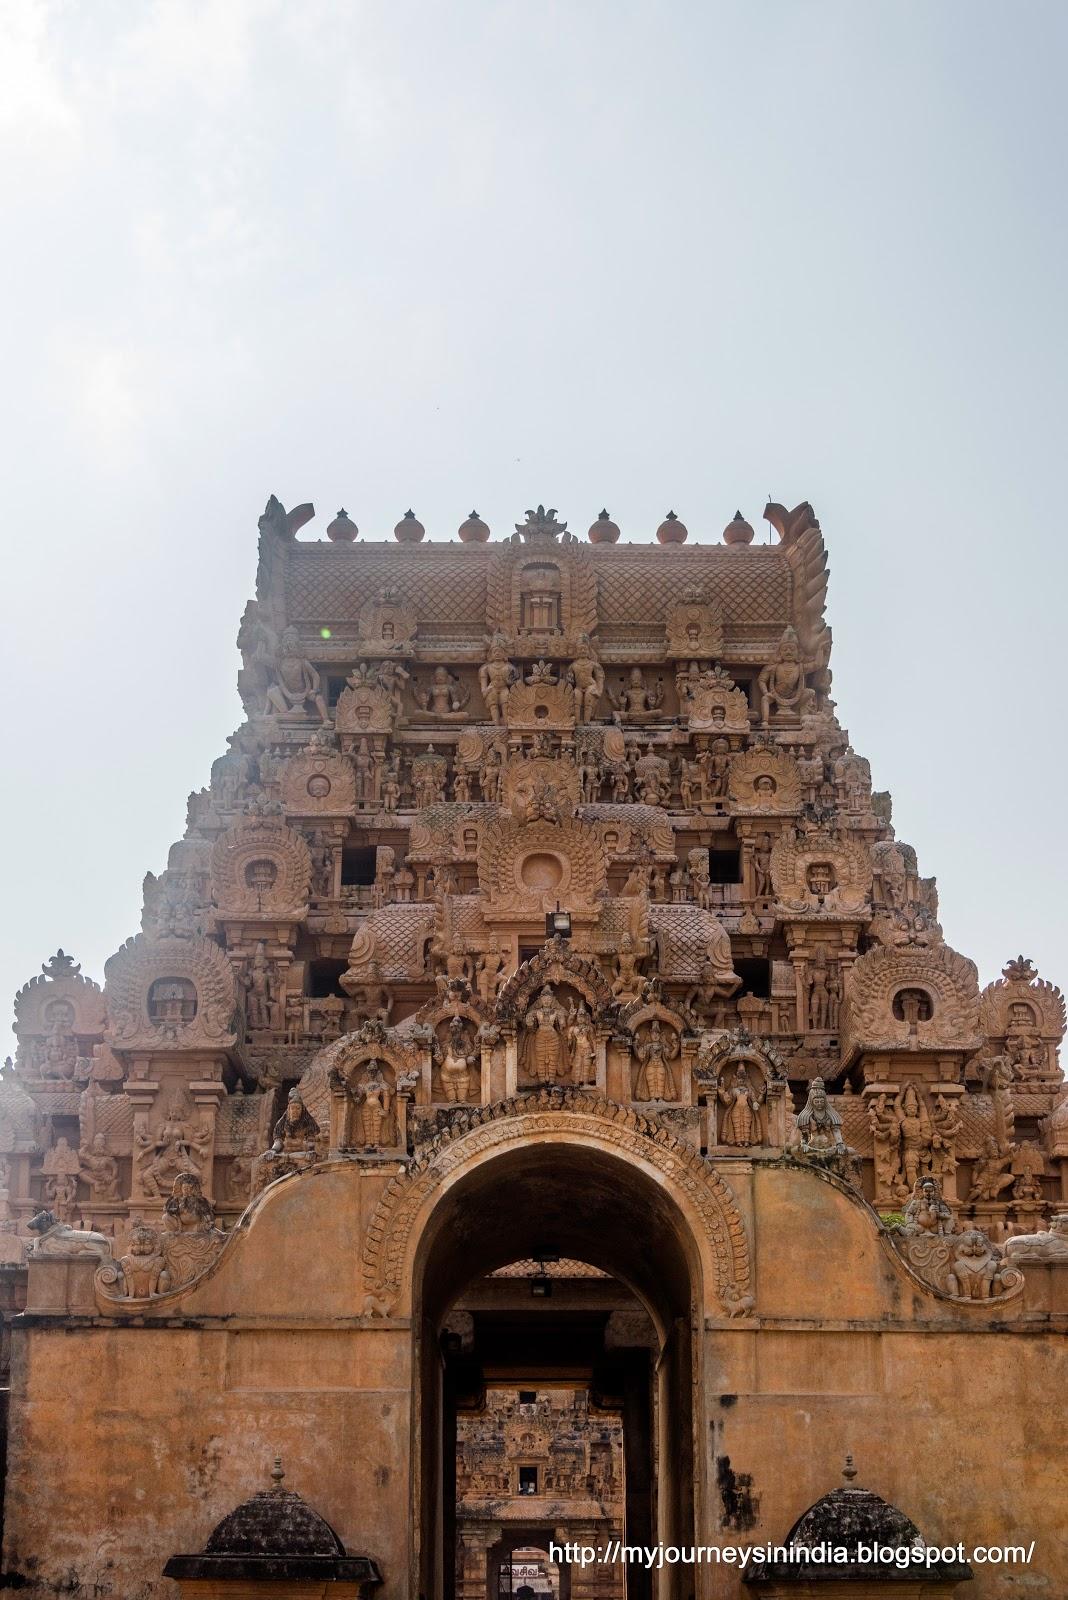 Thanjavur Brihadeeswarar Temple Entrance